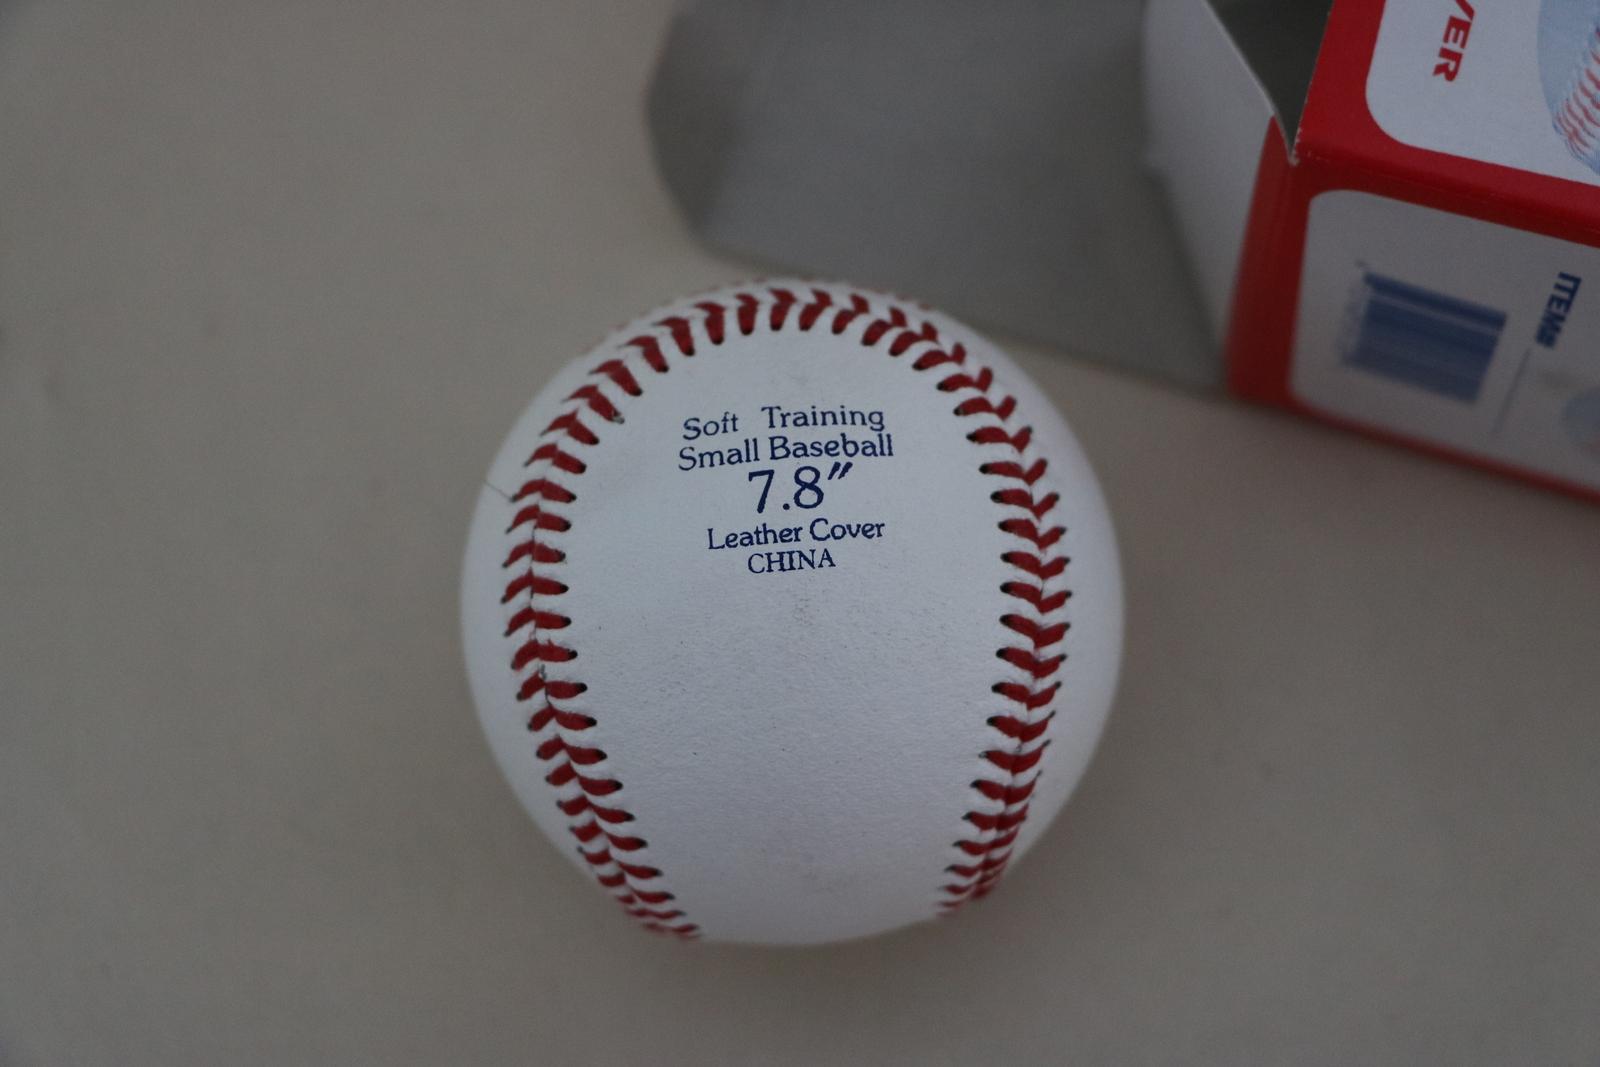 "1 Softie Jugs 7.8"" Training Baseball Small Ball - New in Box"